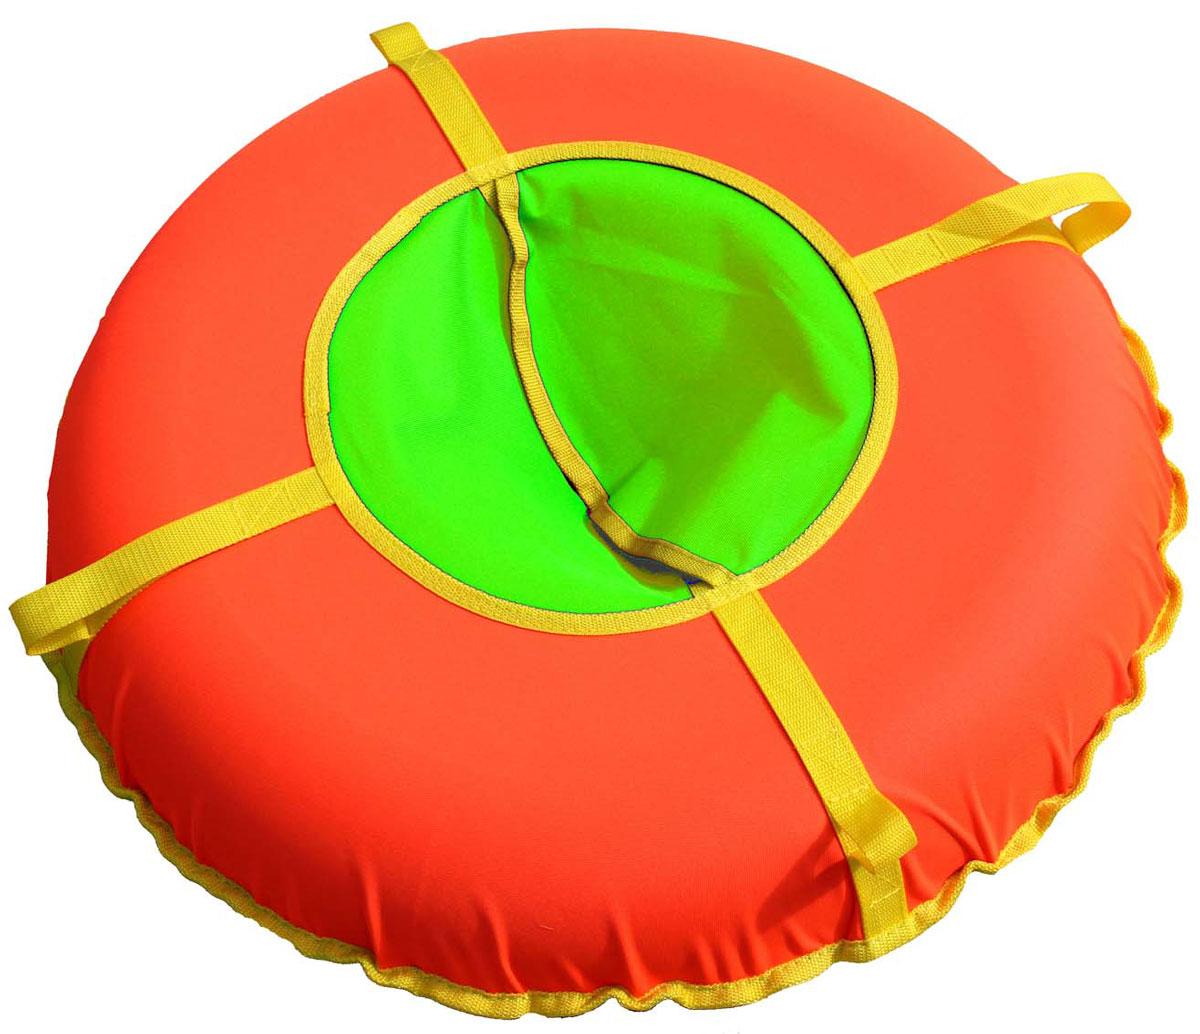 "Super Jet Tubing Тюбинг Super Jet Tubing ""Ultra"", цвет: салатовый, желтый, оранжевый, диаметр 95 см"